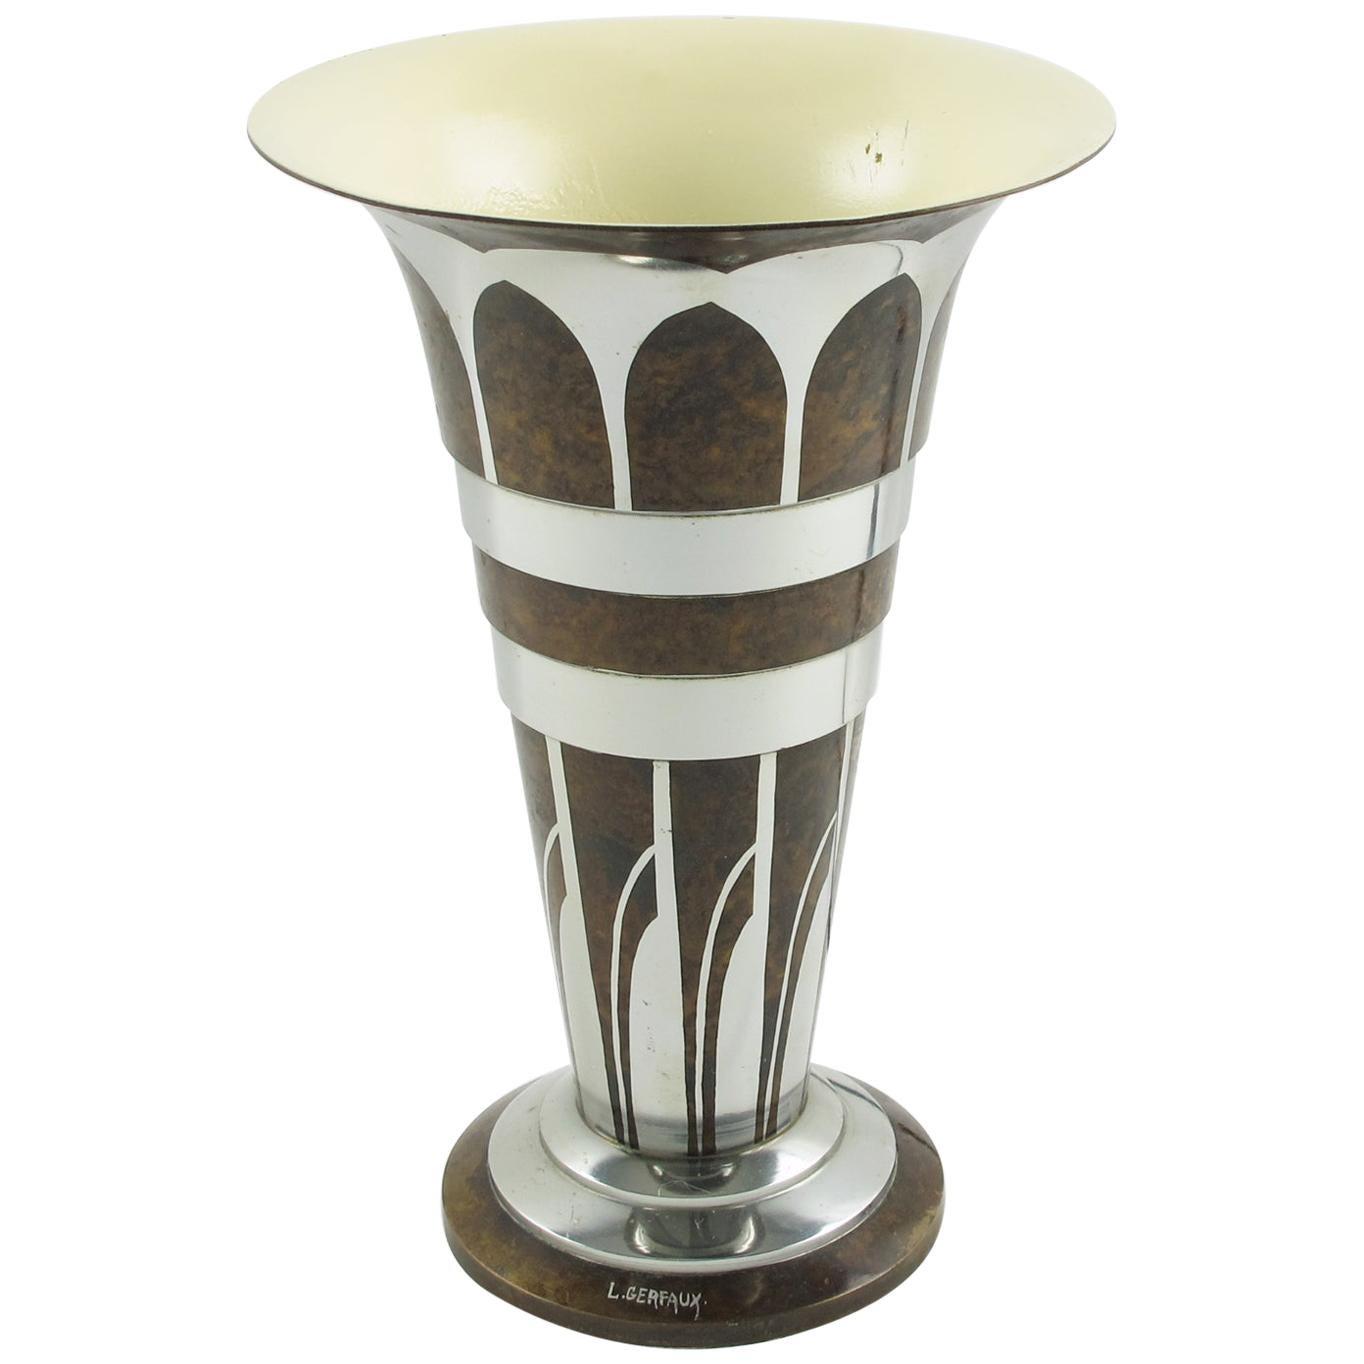 Lucien Gerfaux France 1930s Art Deco Uplight Table Metal Lamp